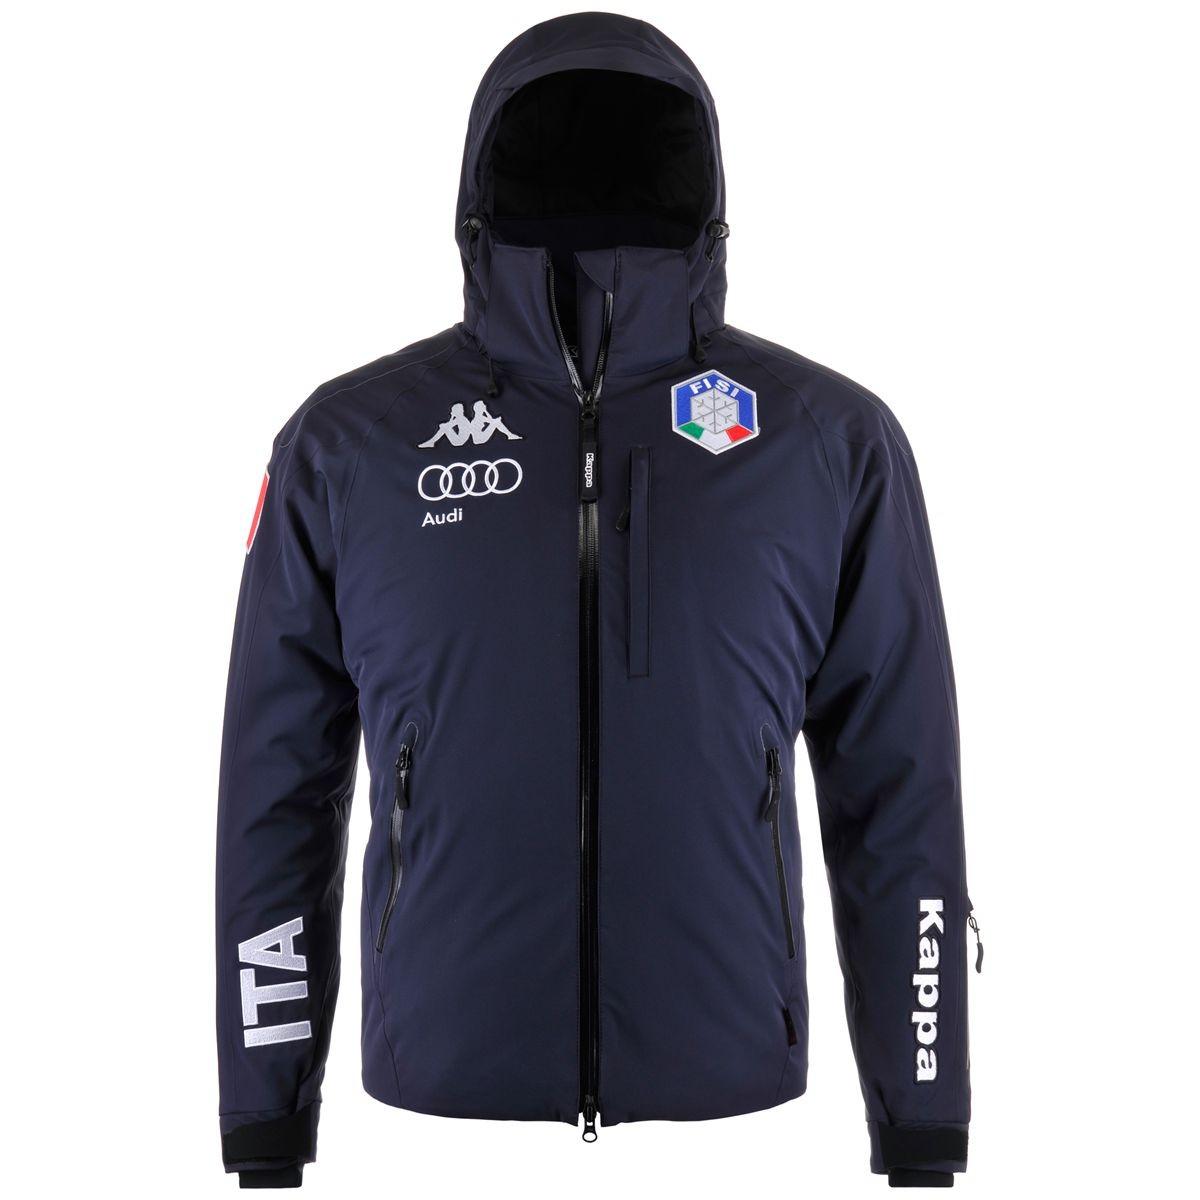 *SALE* Fisi Kappa 6CENTO 611 611A Italy Audi Skiing Team Jacket Coat size XL